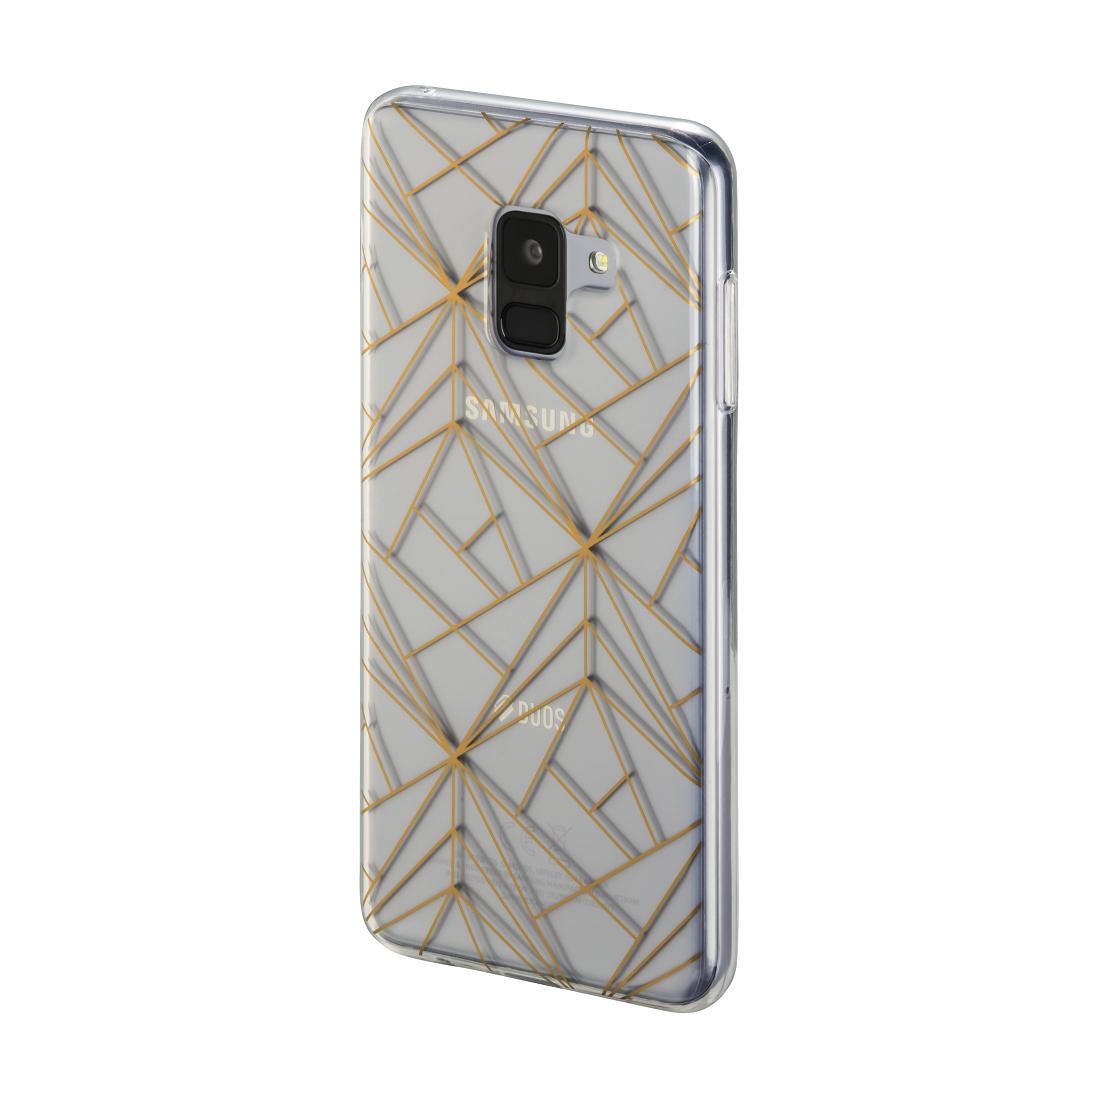 00172123 Hama Cover Golden Graphics Fur Samsung Galaxy A8 2018